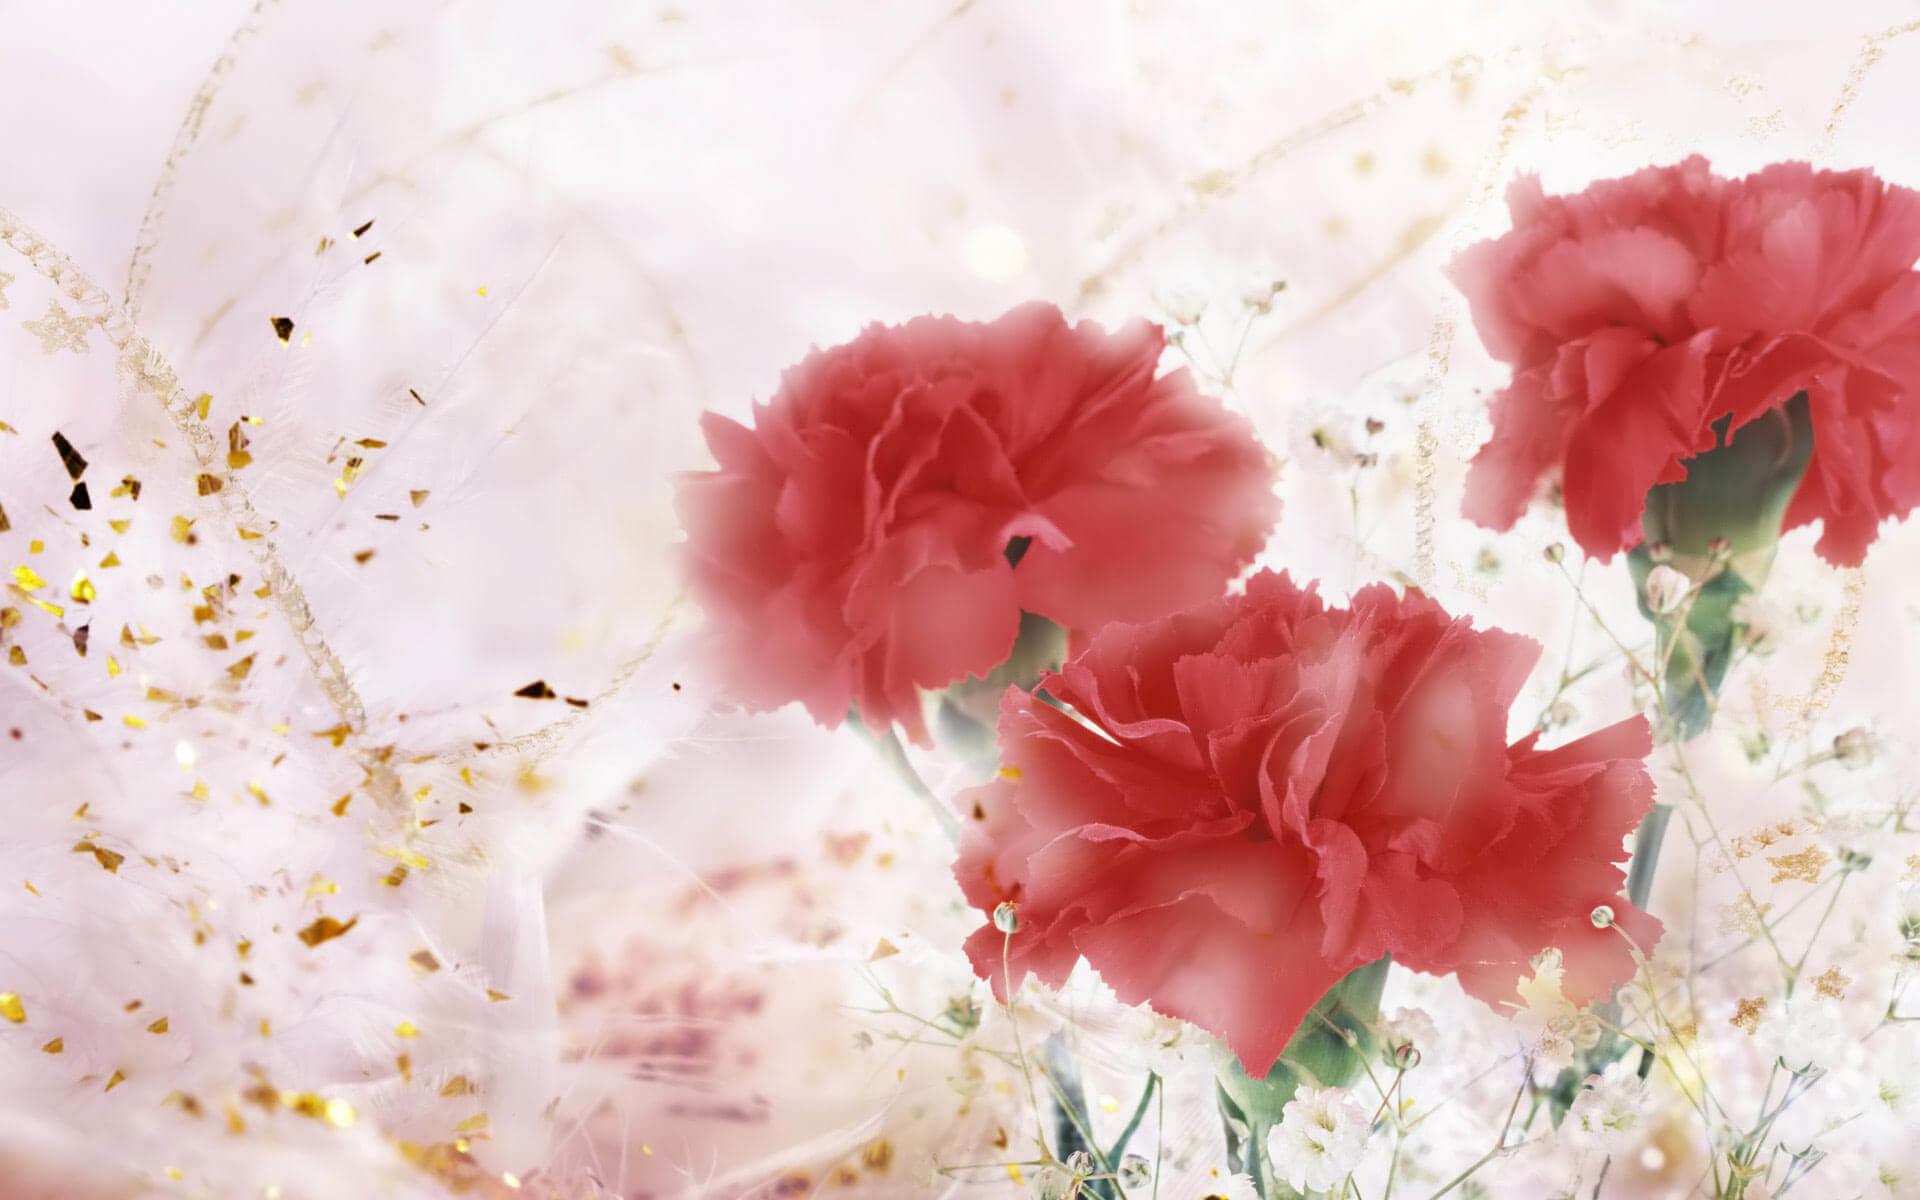 … Gifts-Flowers-Valentine-desktop-backgrounds …